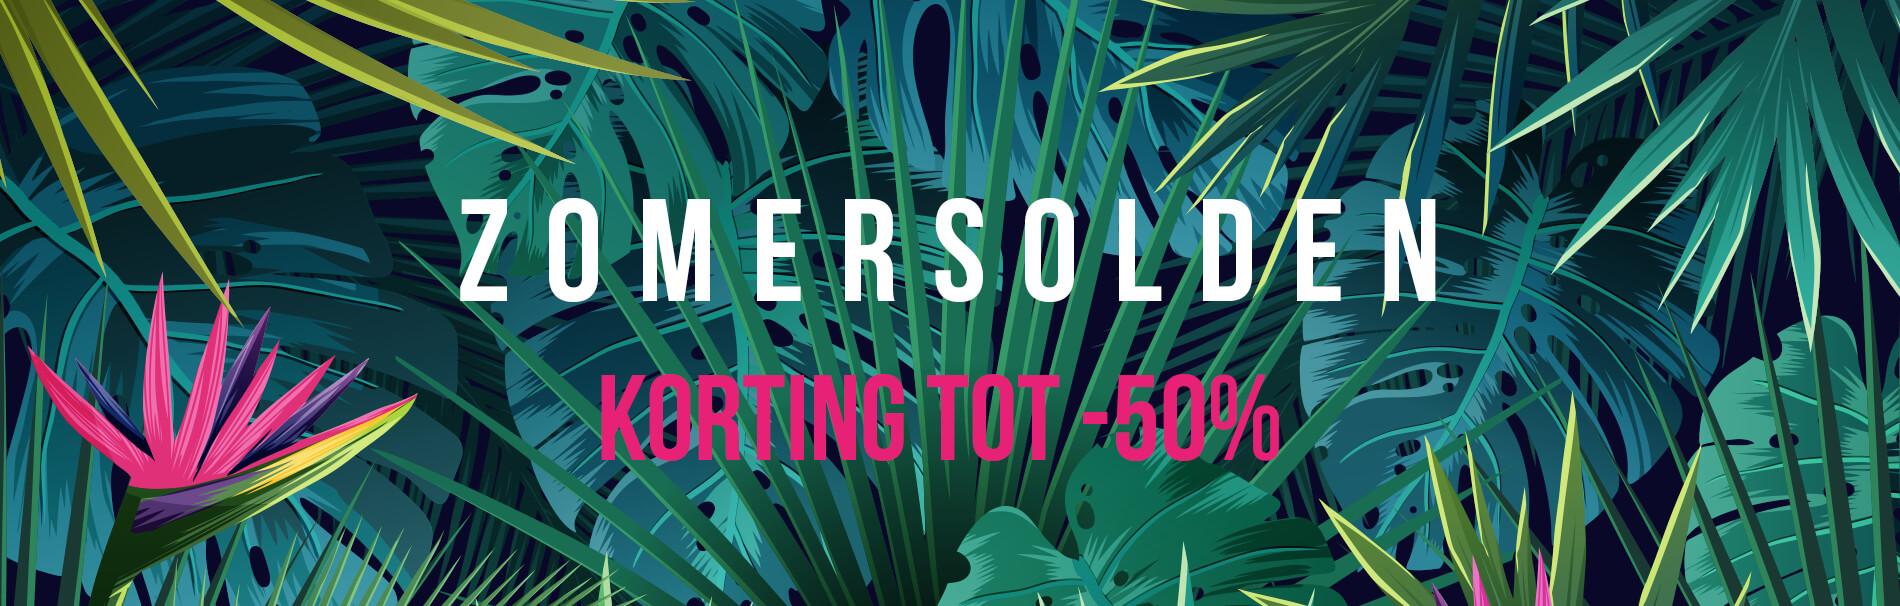 Summer Sales 2018